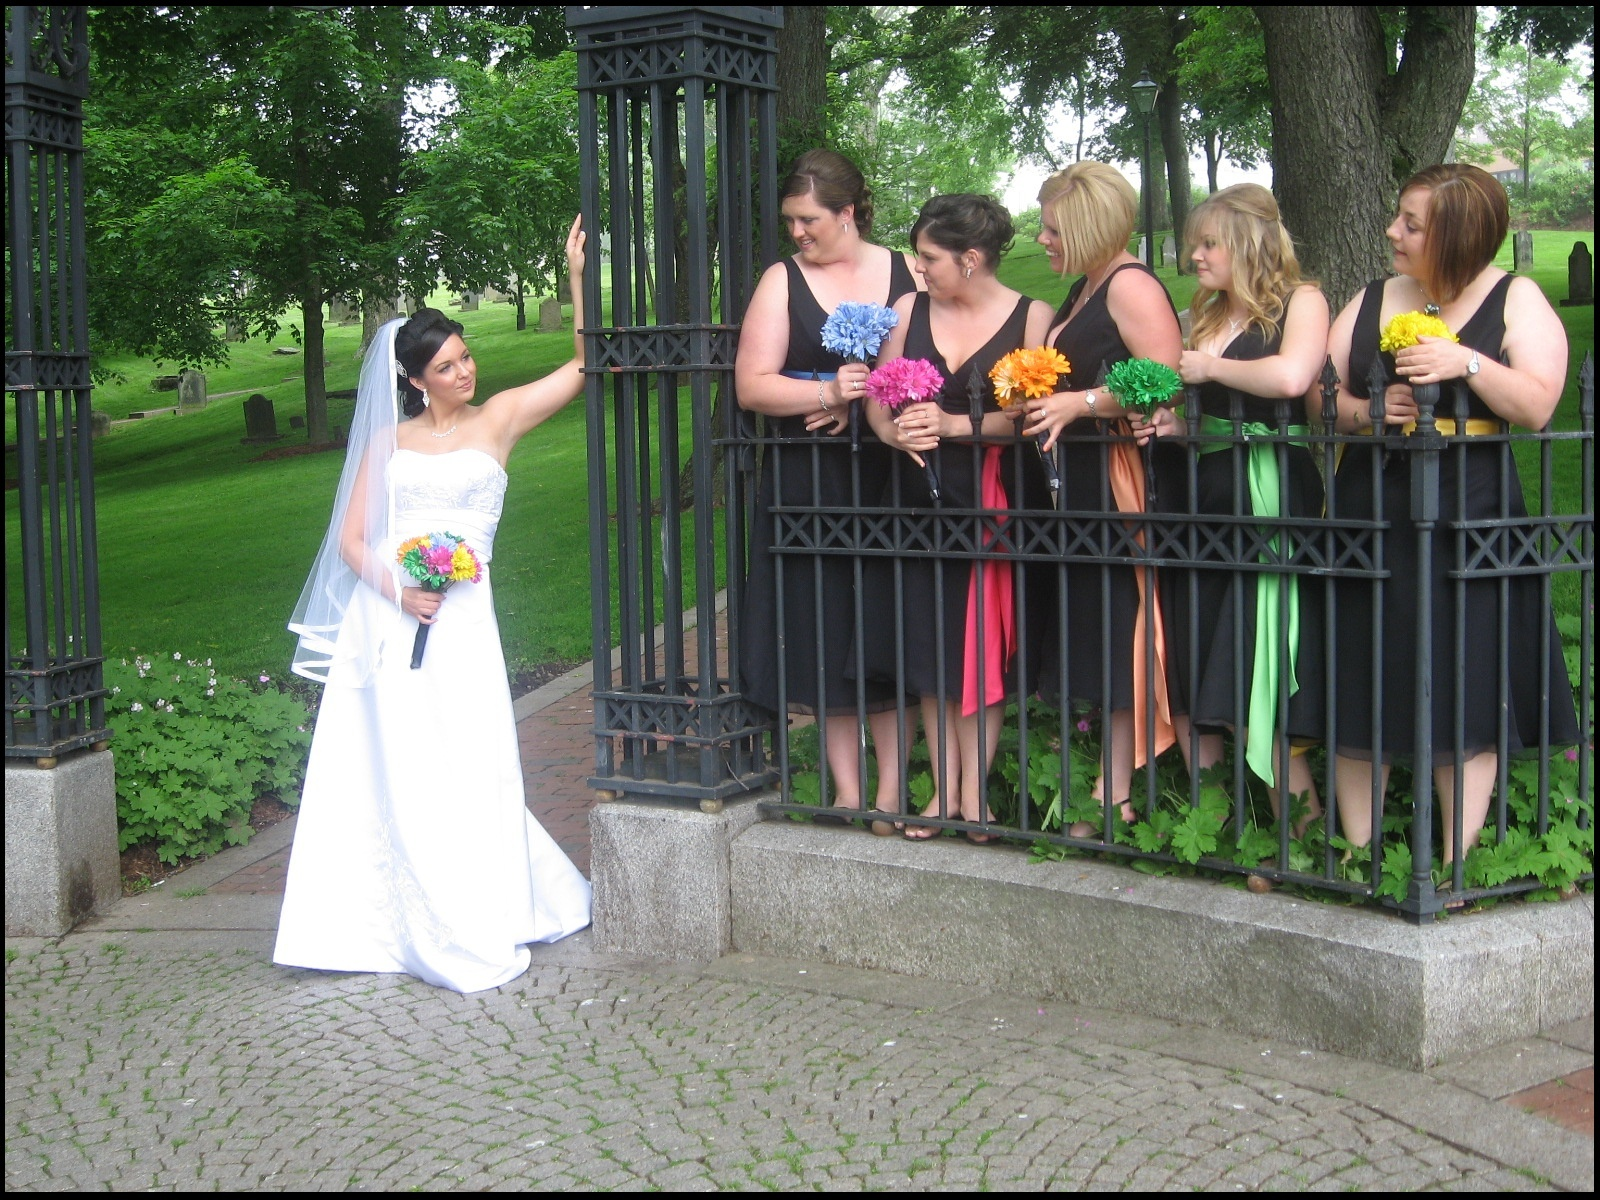 Flowers & Decor, Bridesmaids, Bridesmaids Dresses, Wedding Dresses, Fashion, yellow, orange, pink, blue, green, black, dress, Bridesmaid Bouquets, Flowers, Flower Wedding Dresses